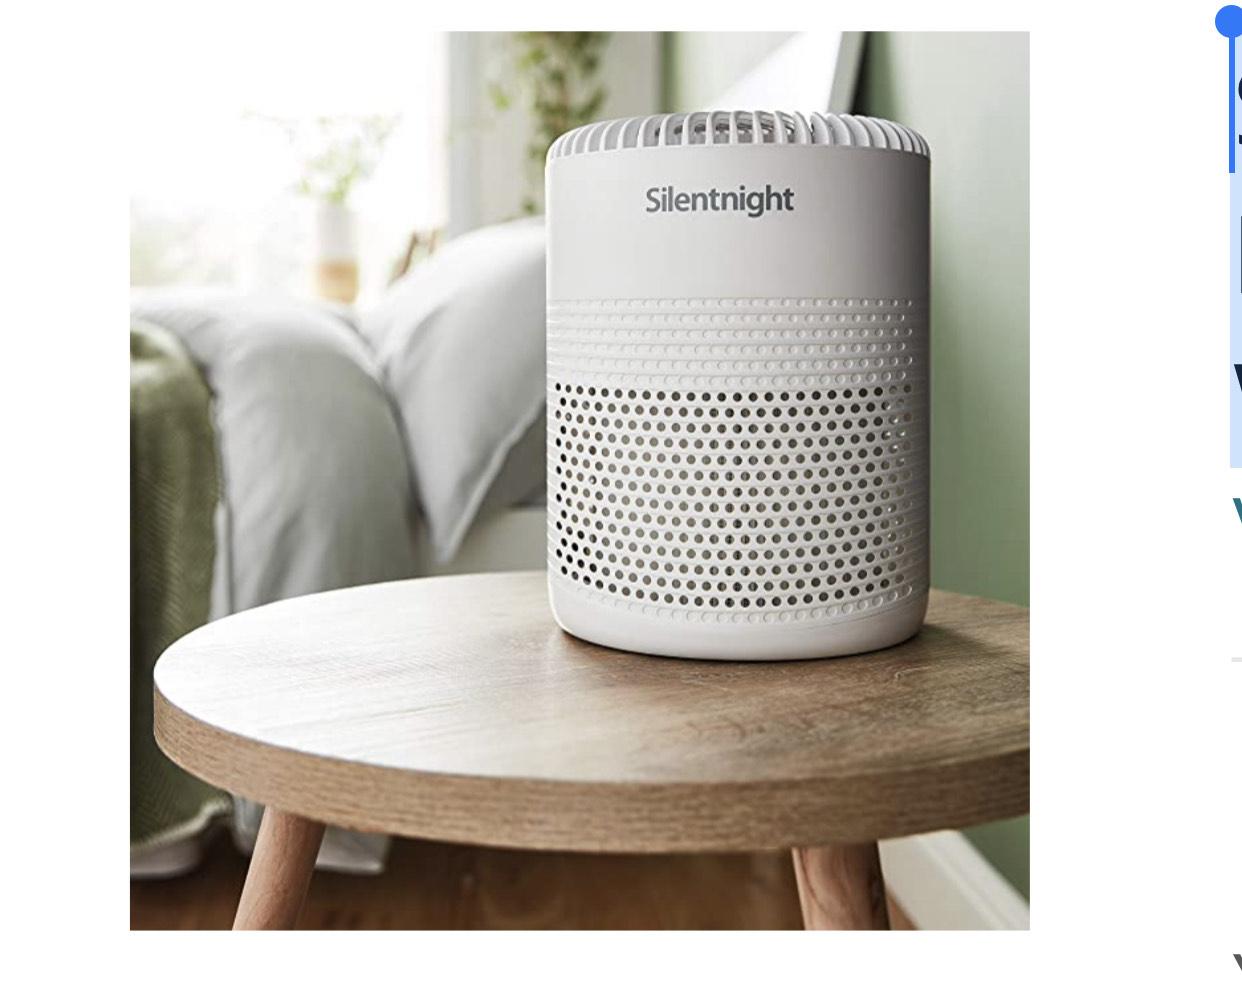 Silentnight 42269 Air Purifier with HEPA Filter Night Light, Plastic, 7.5 W [Energy Class A+++] - £38.43 @ Amazon